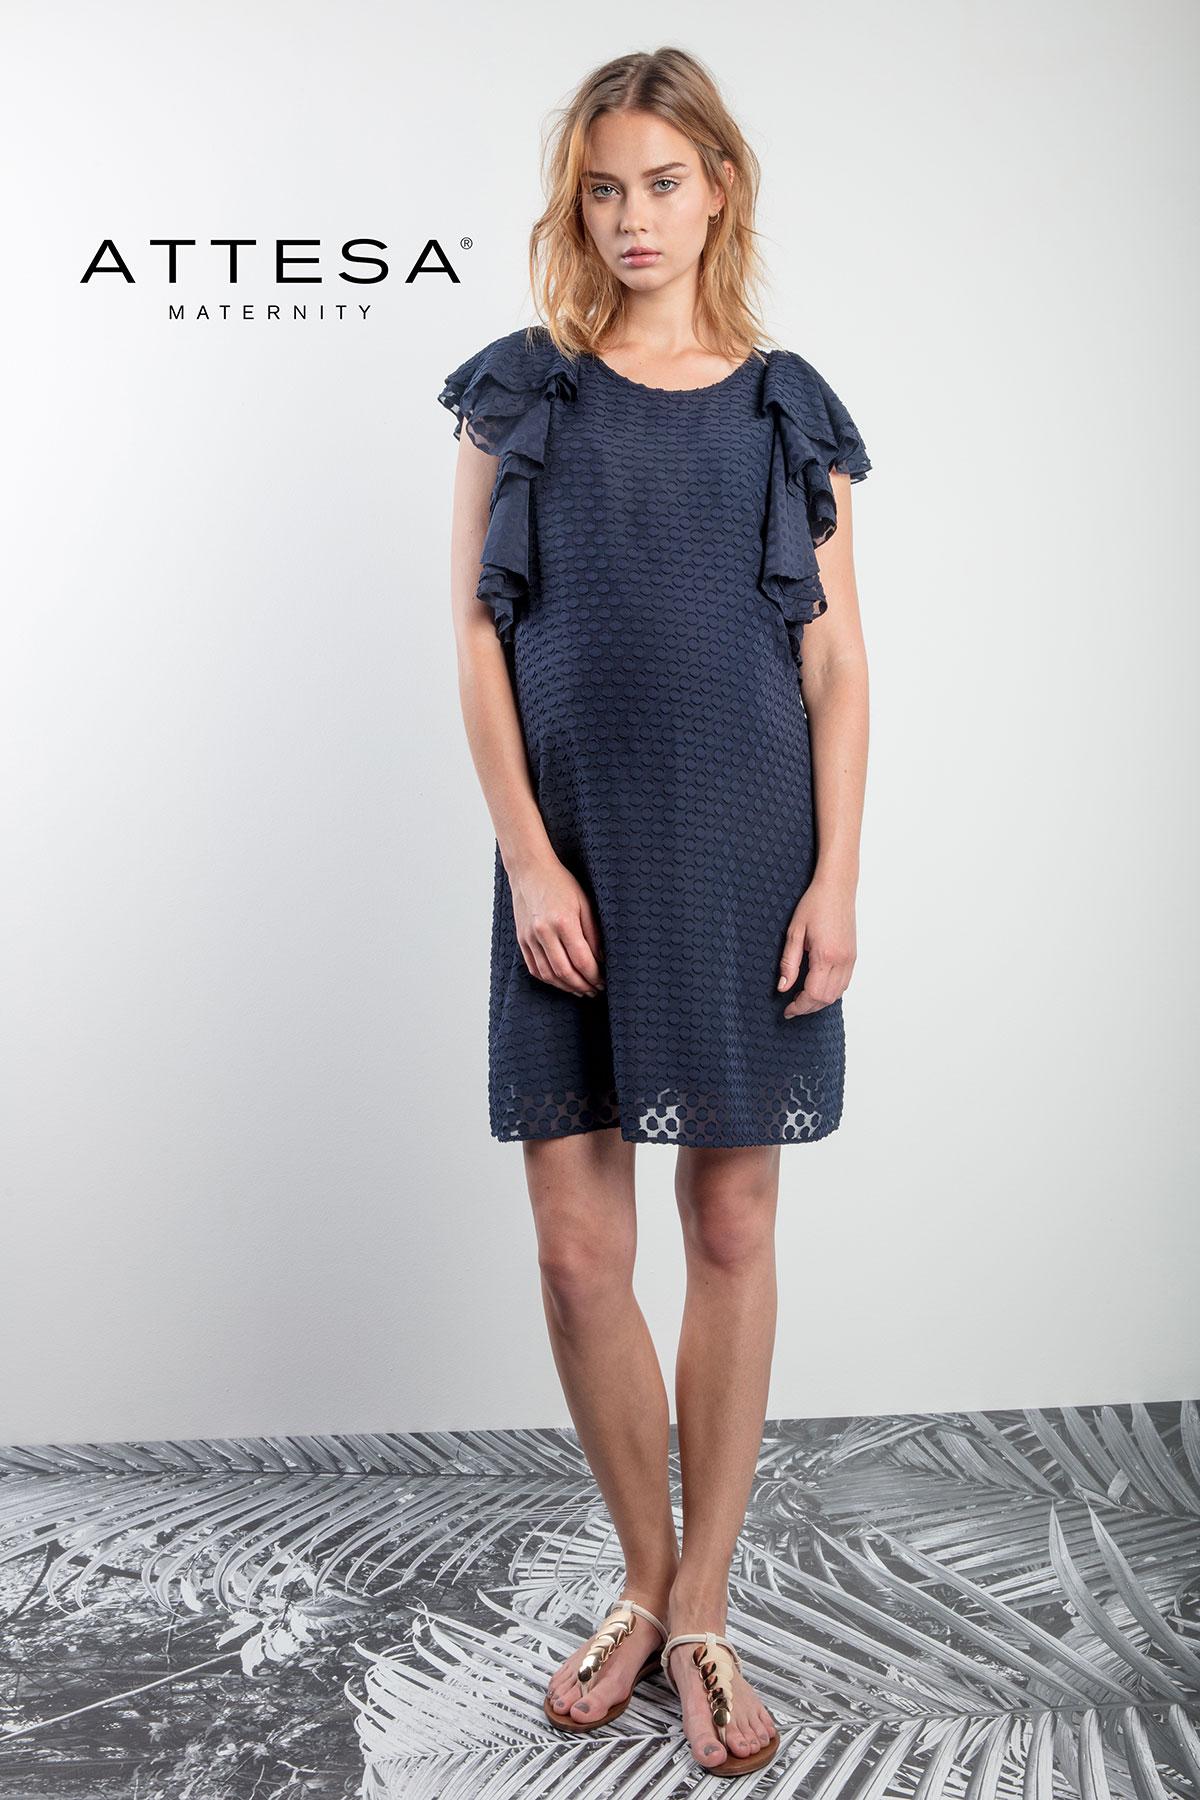 attesa maternity dress